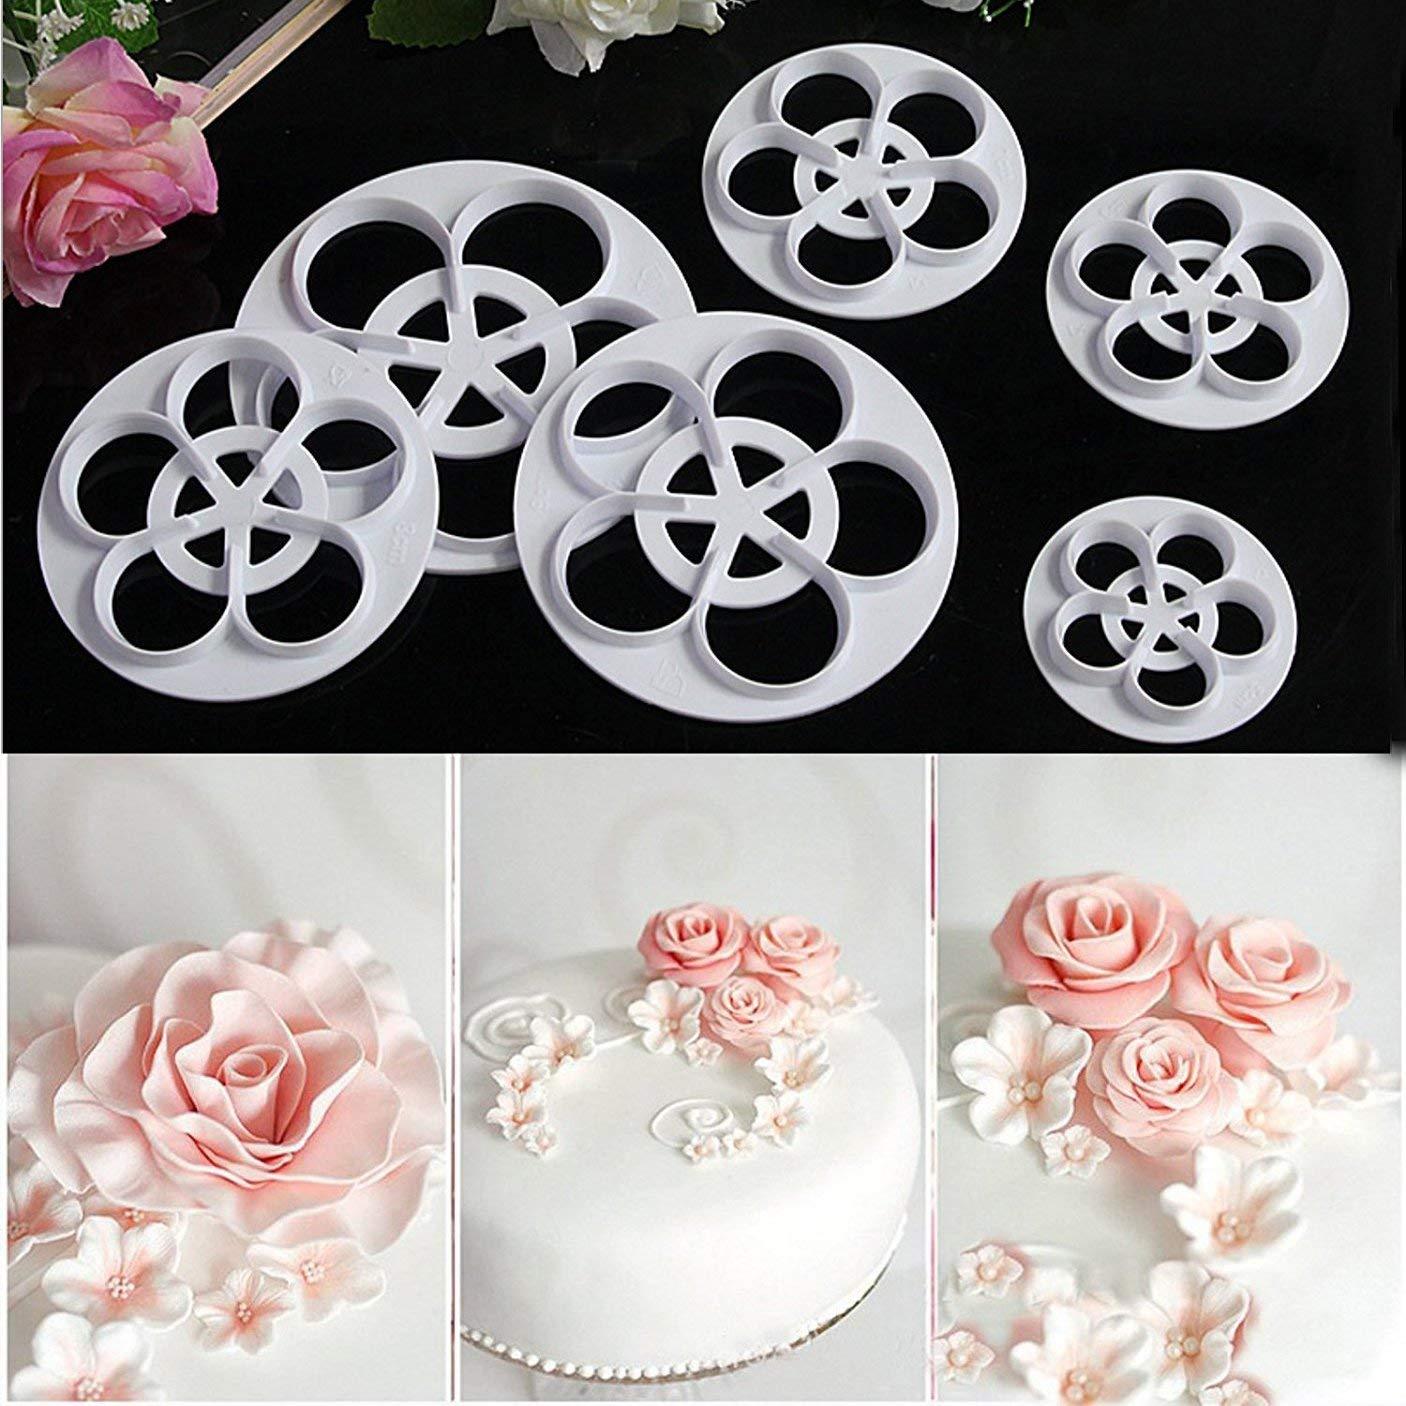 OFKPO 6pcs Rose Ever cutter//cake Decorating Stampo per biscotti fondente Bianco